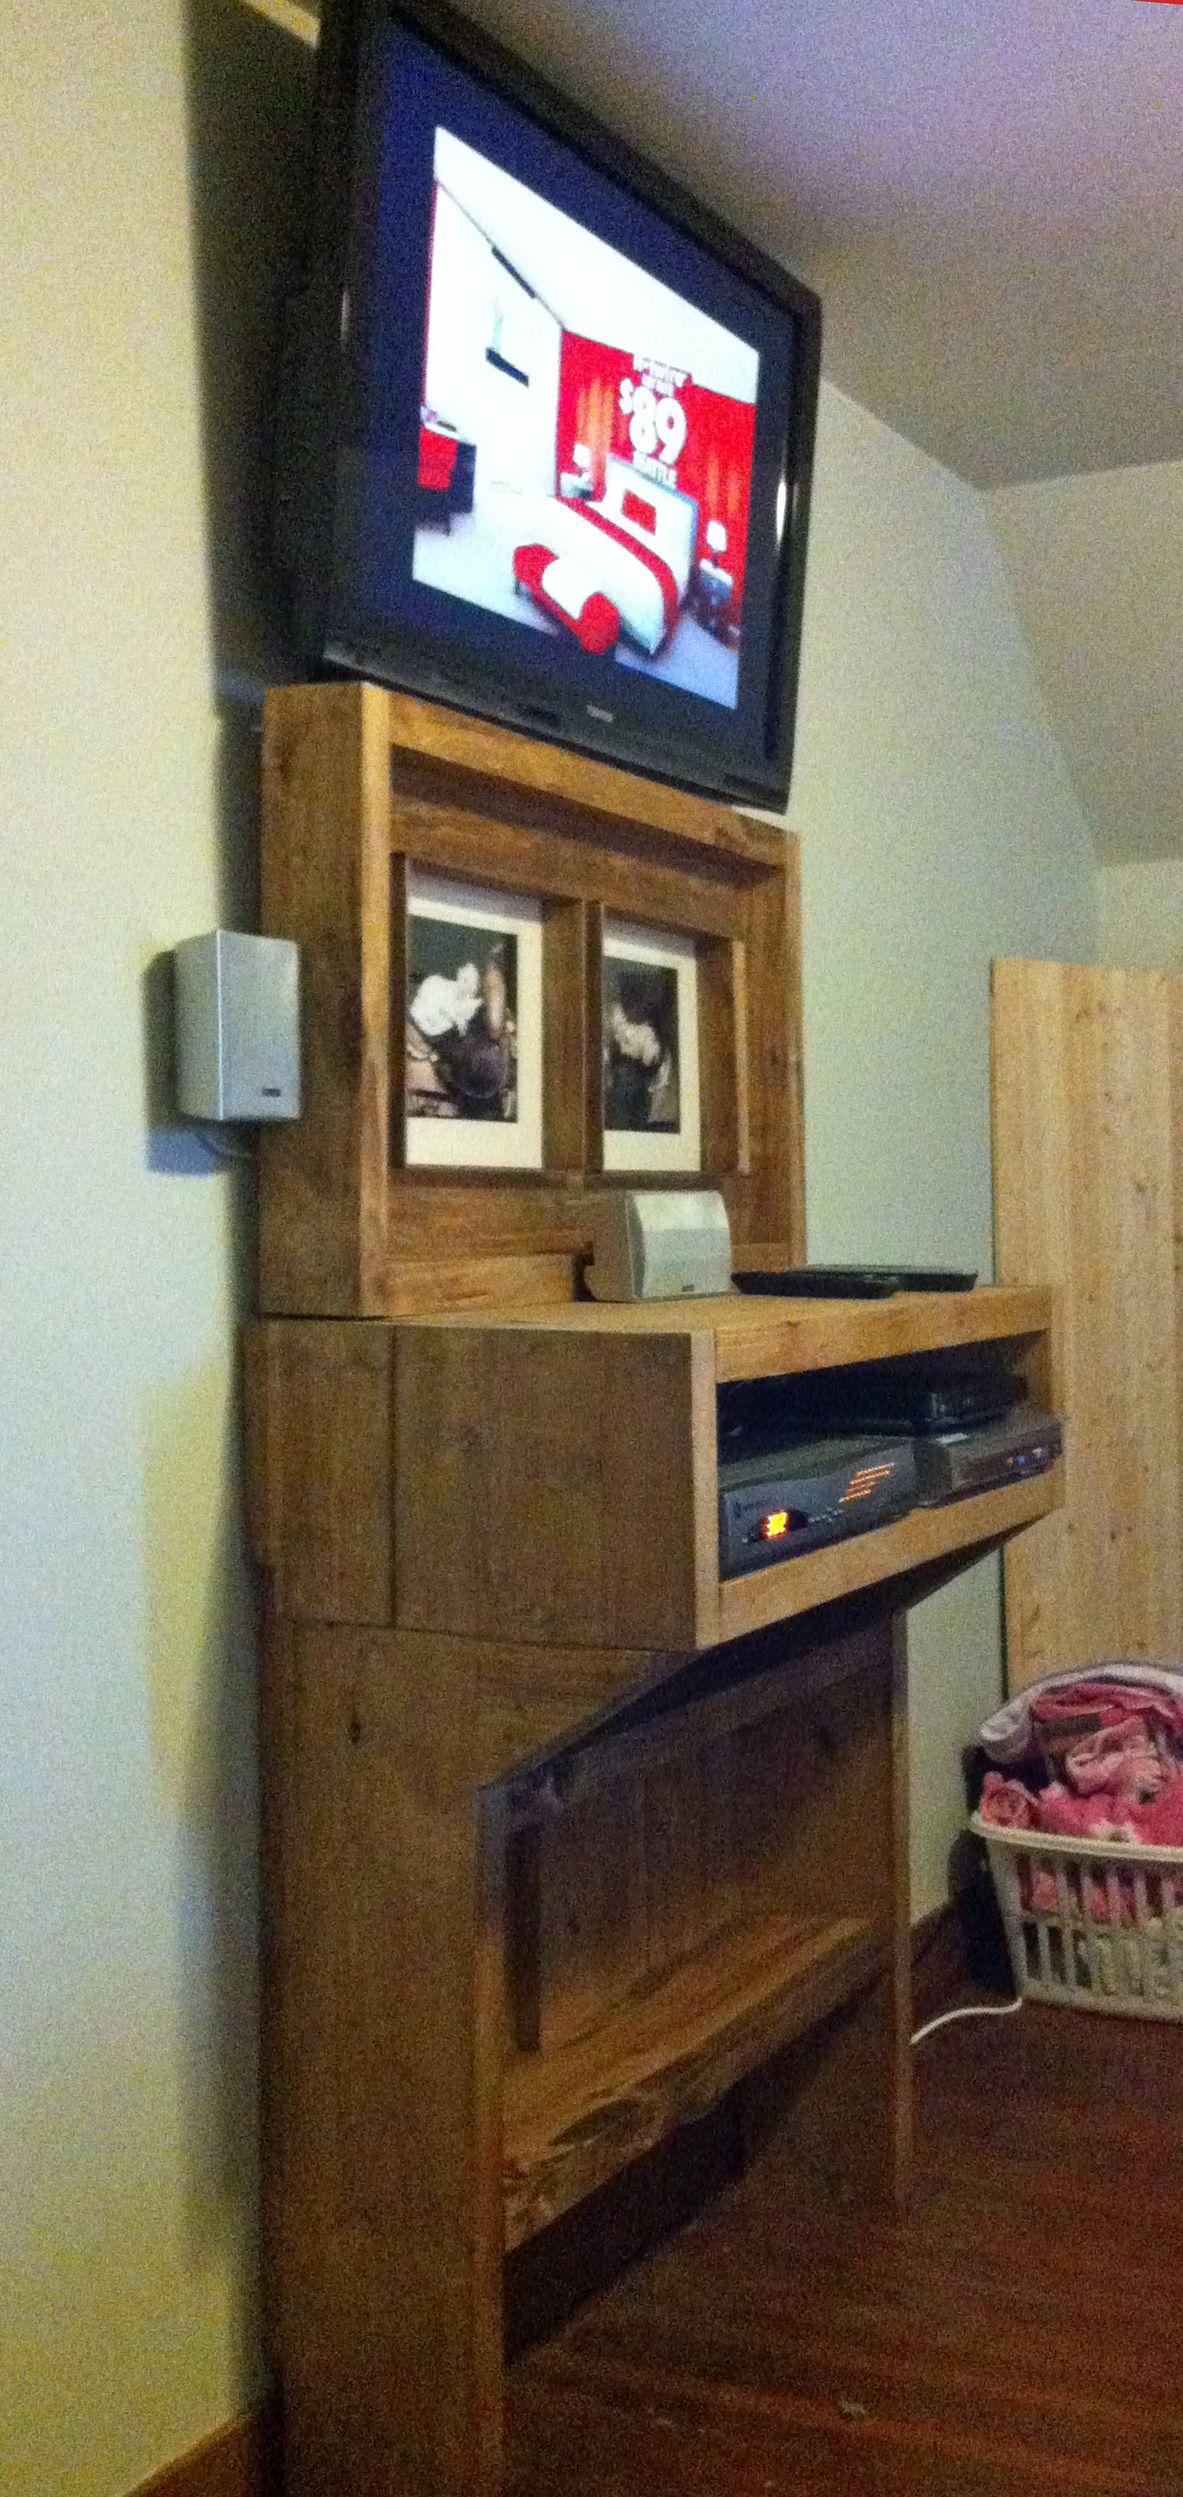 The Bedroom TV Shelf Project Wall Mount Tv Shelf Tv